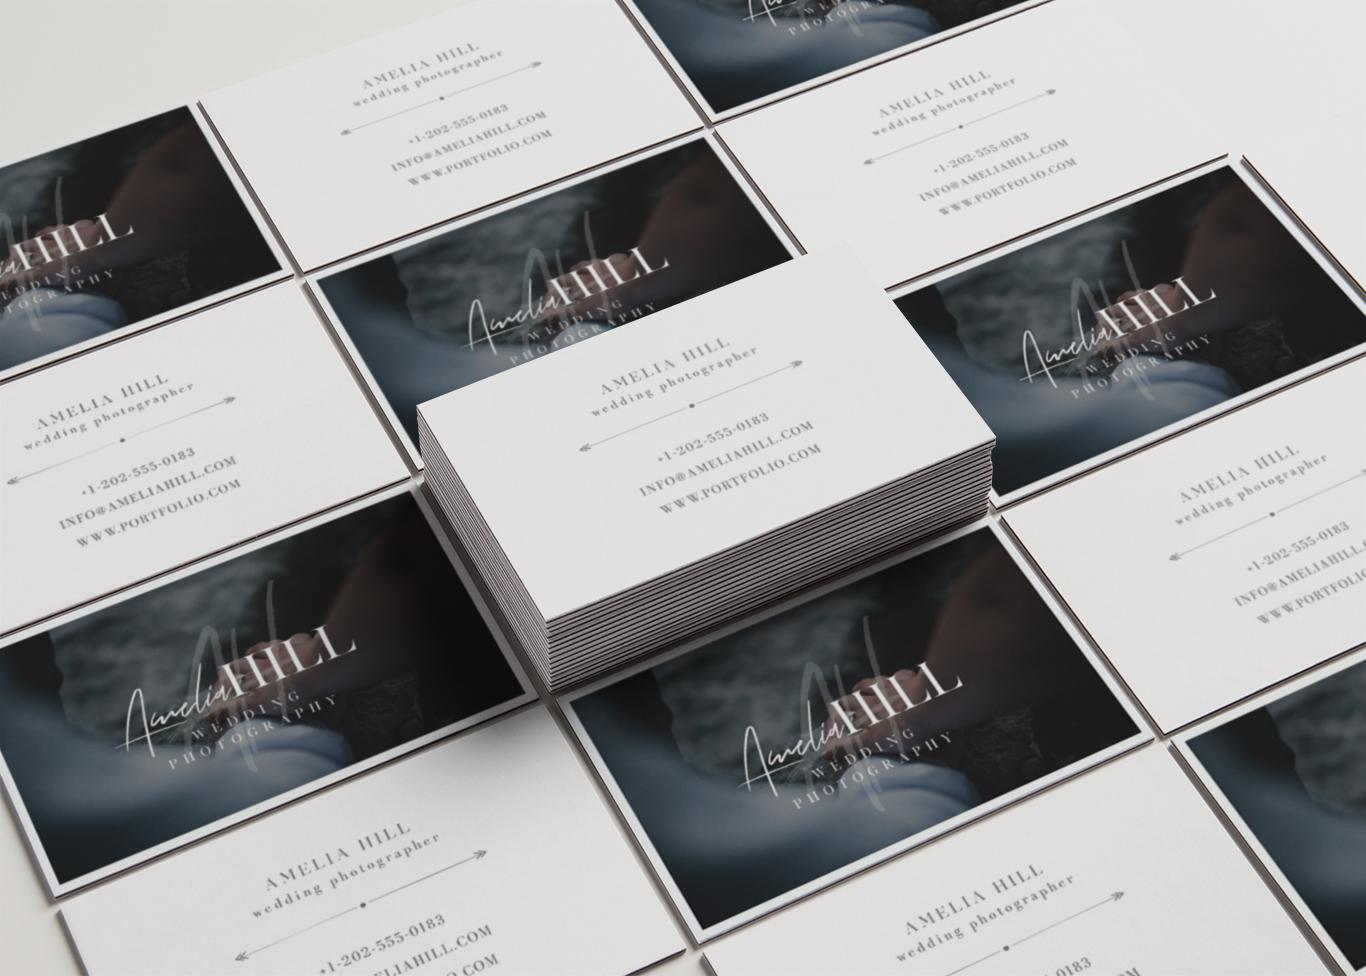 Wedding photography business card wedding photography business card example image 2 colourmoves